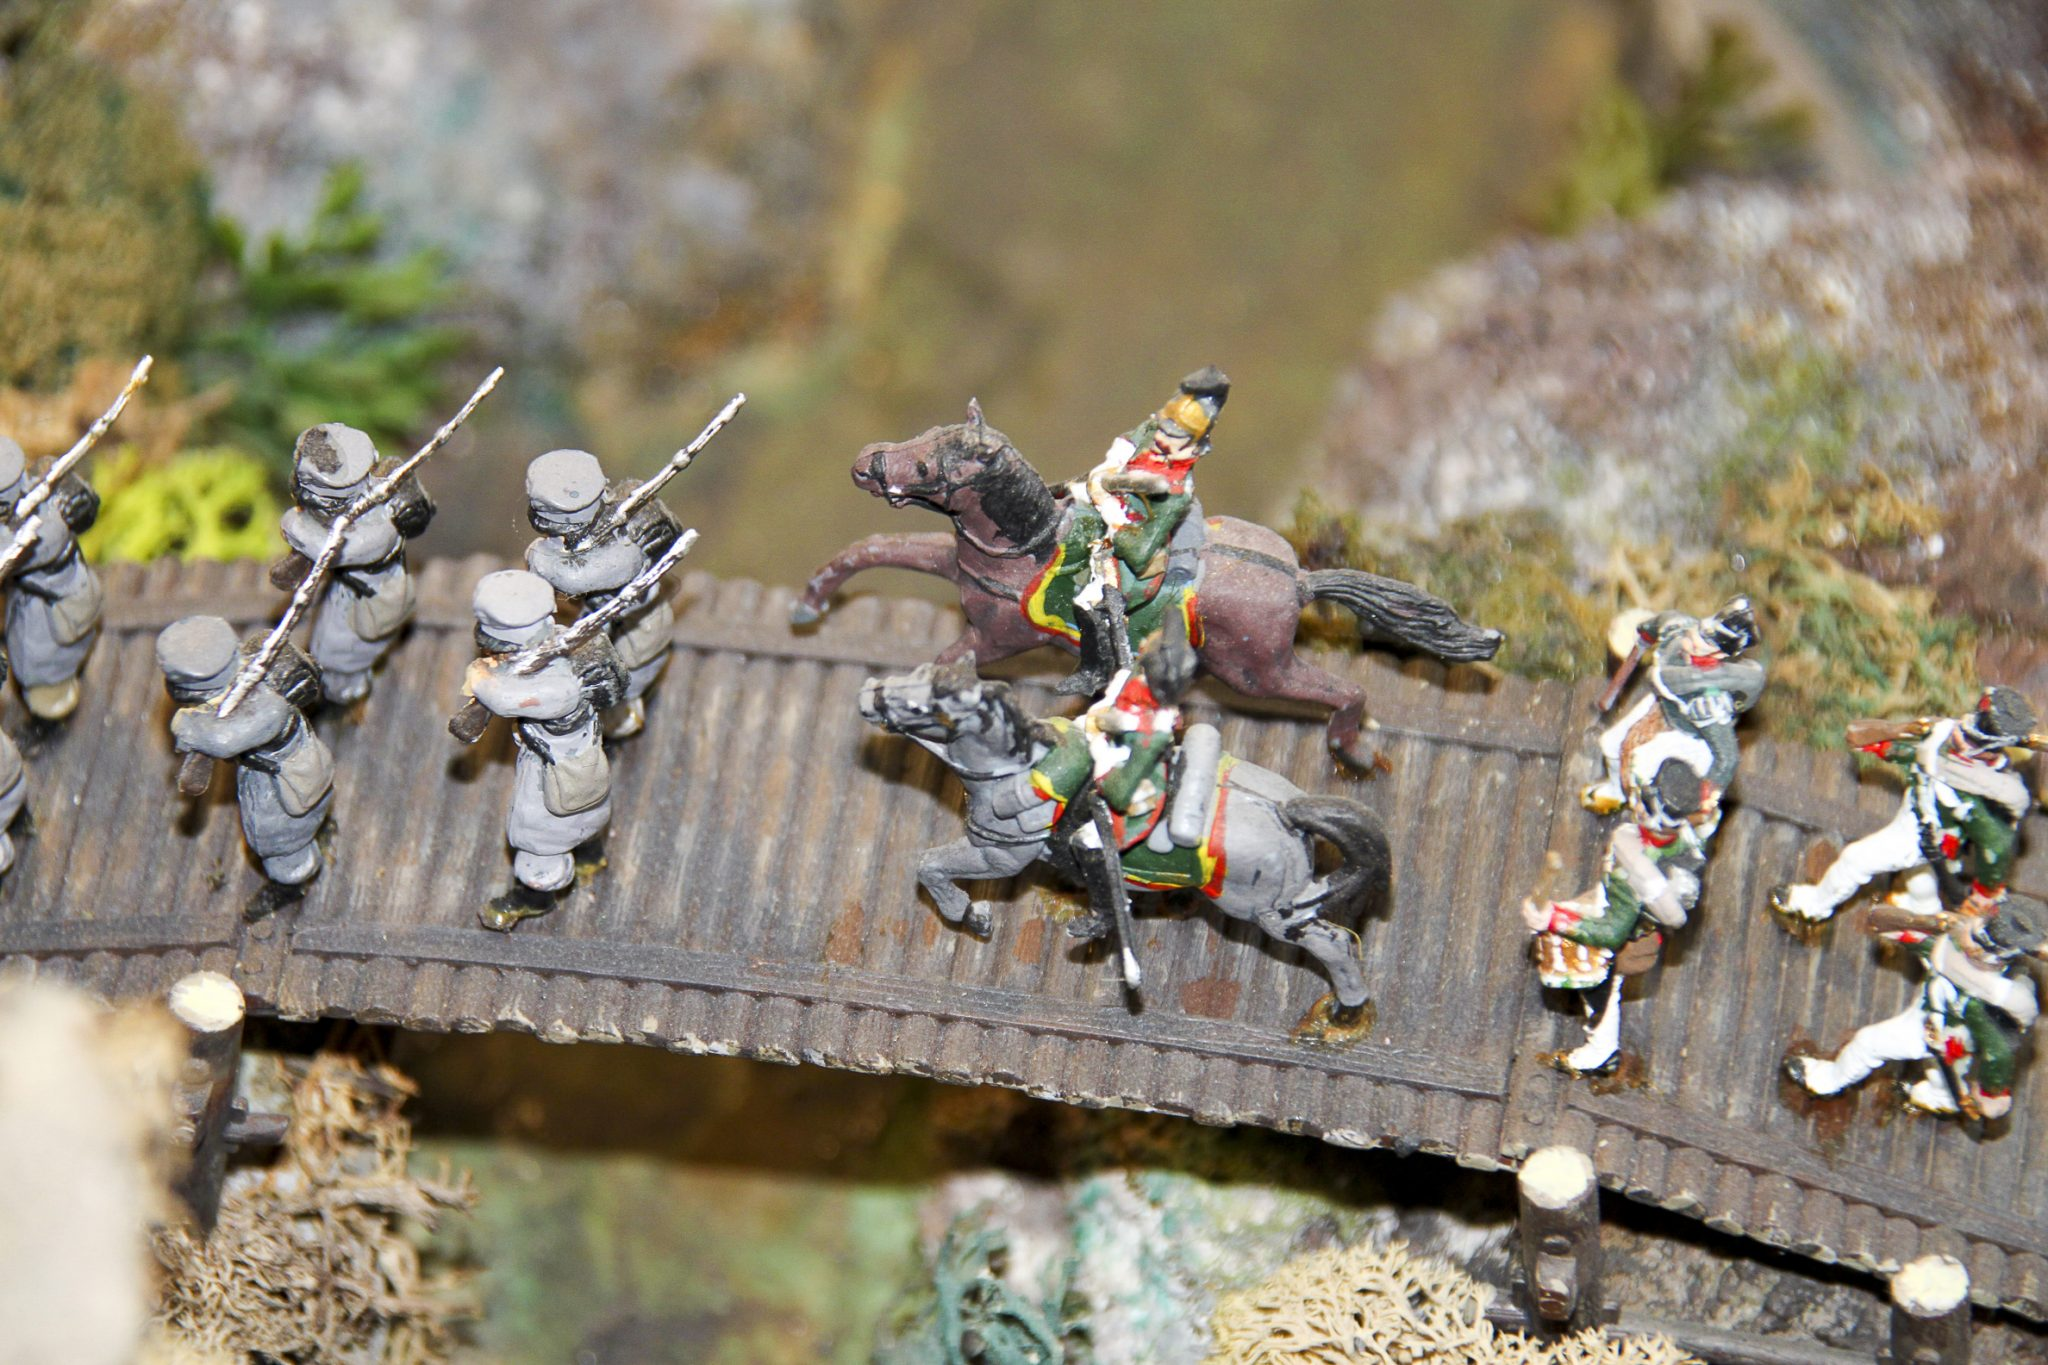 Musée de le Figurine de Tulette - Détail : Bataille de Borodino